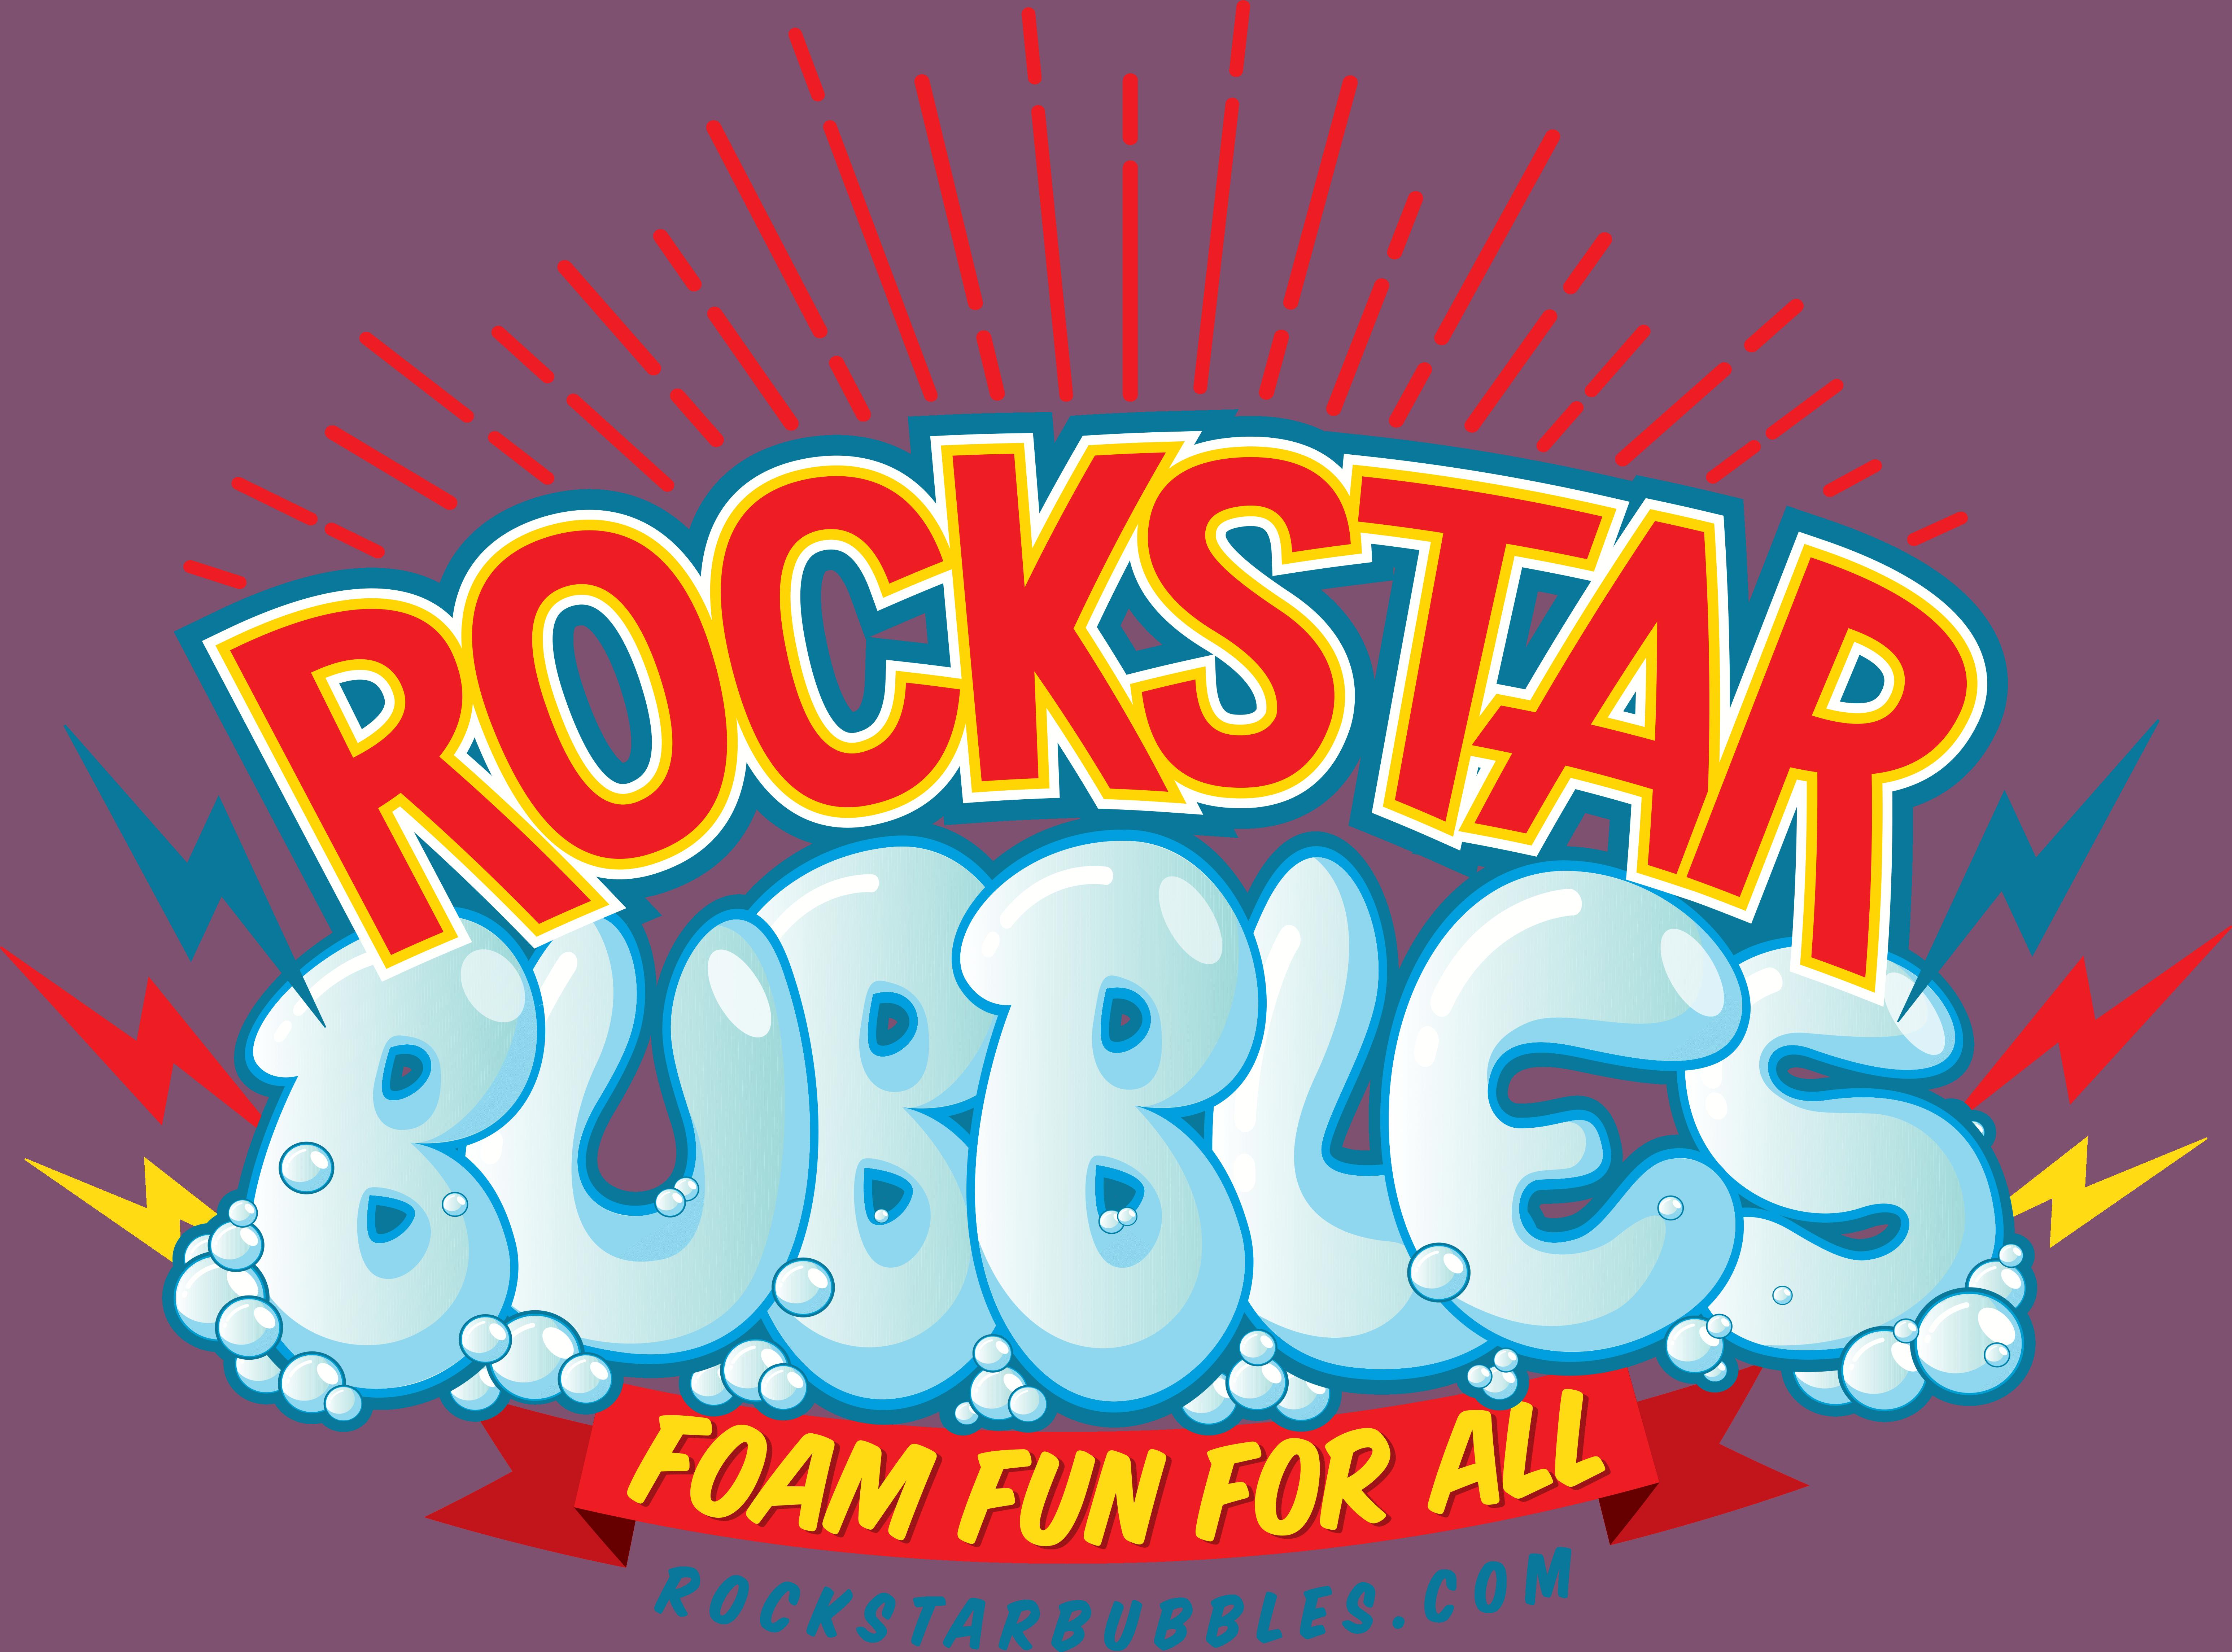 rockstar bubbles logo